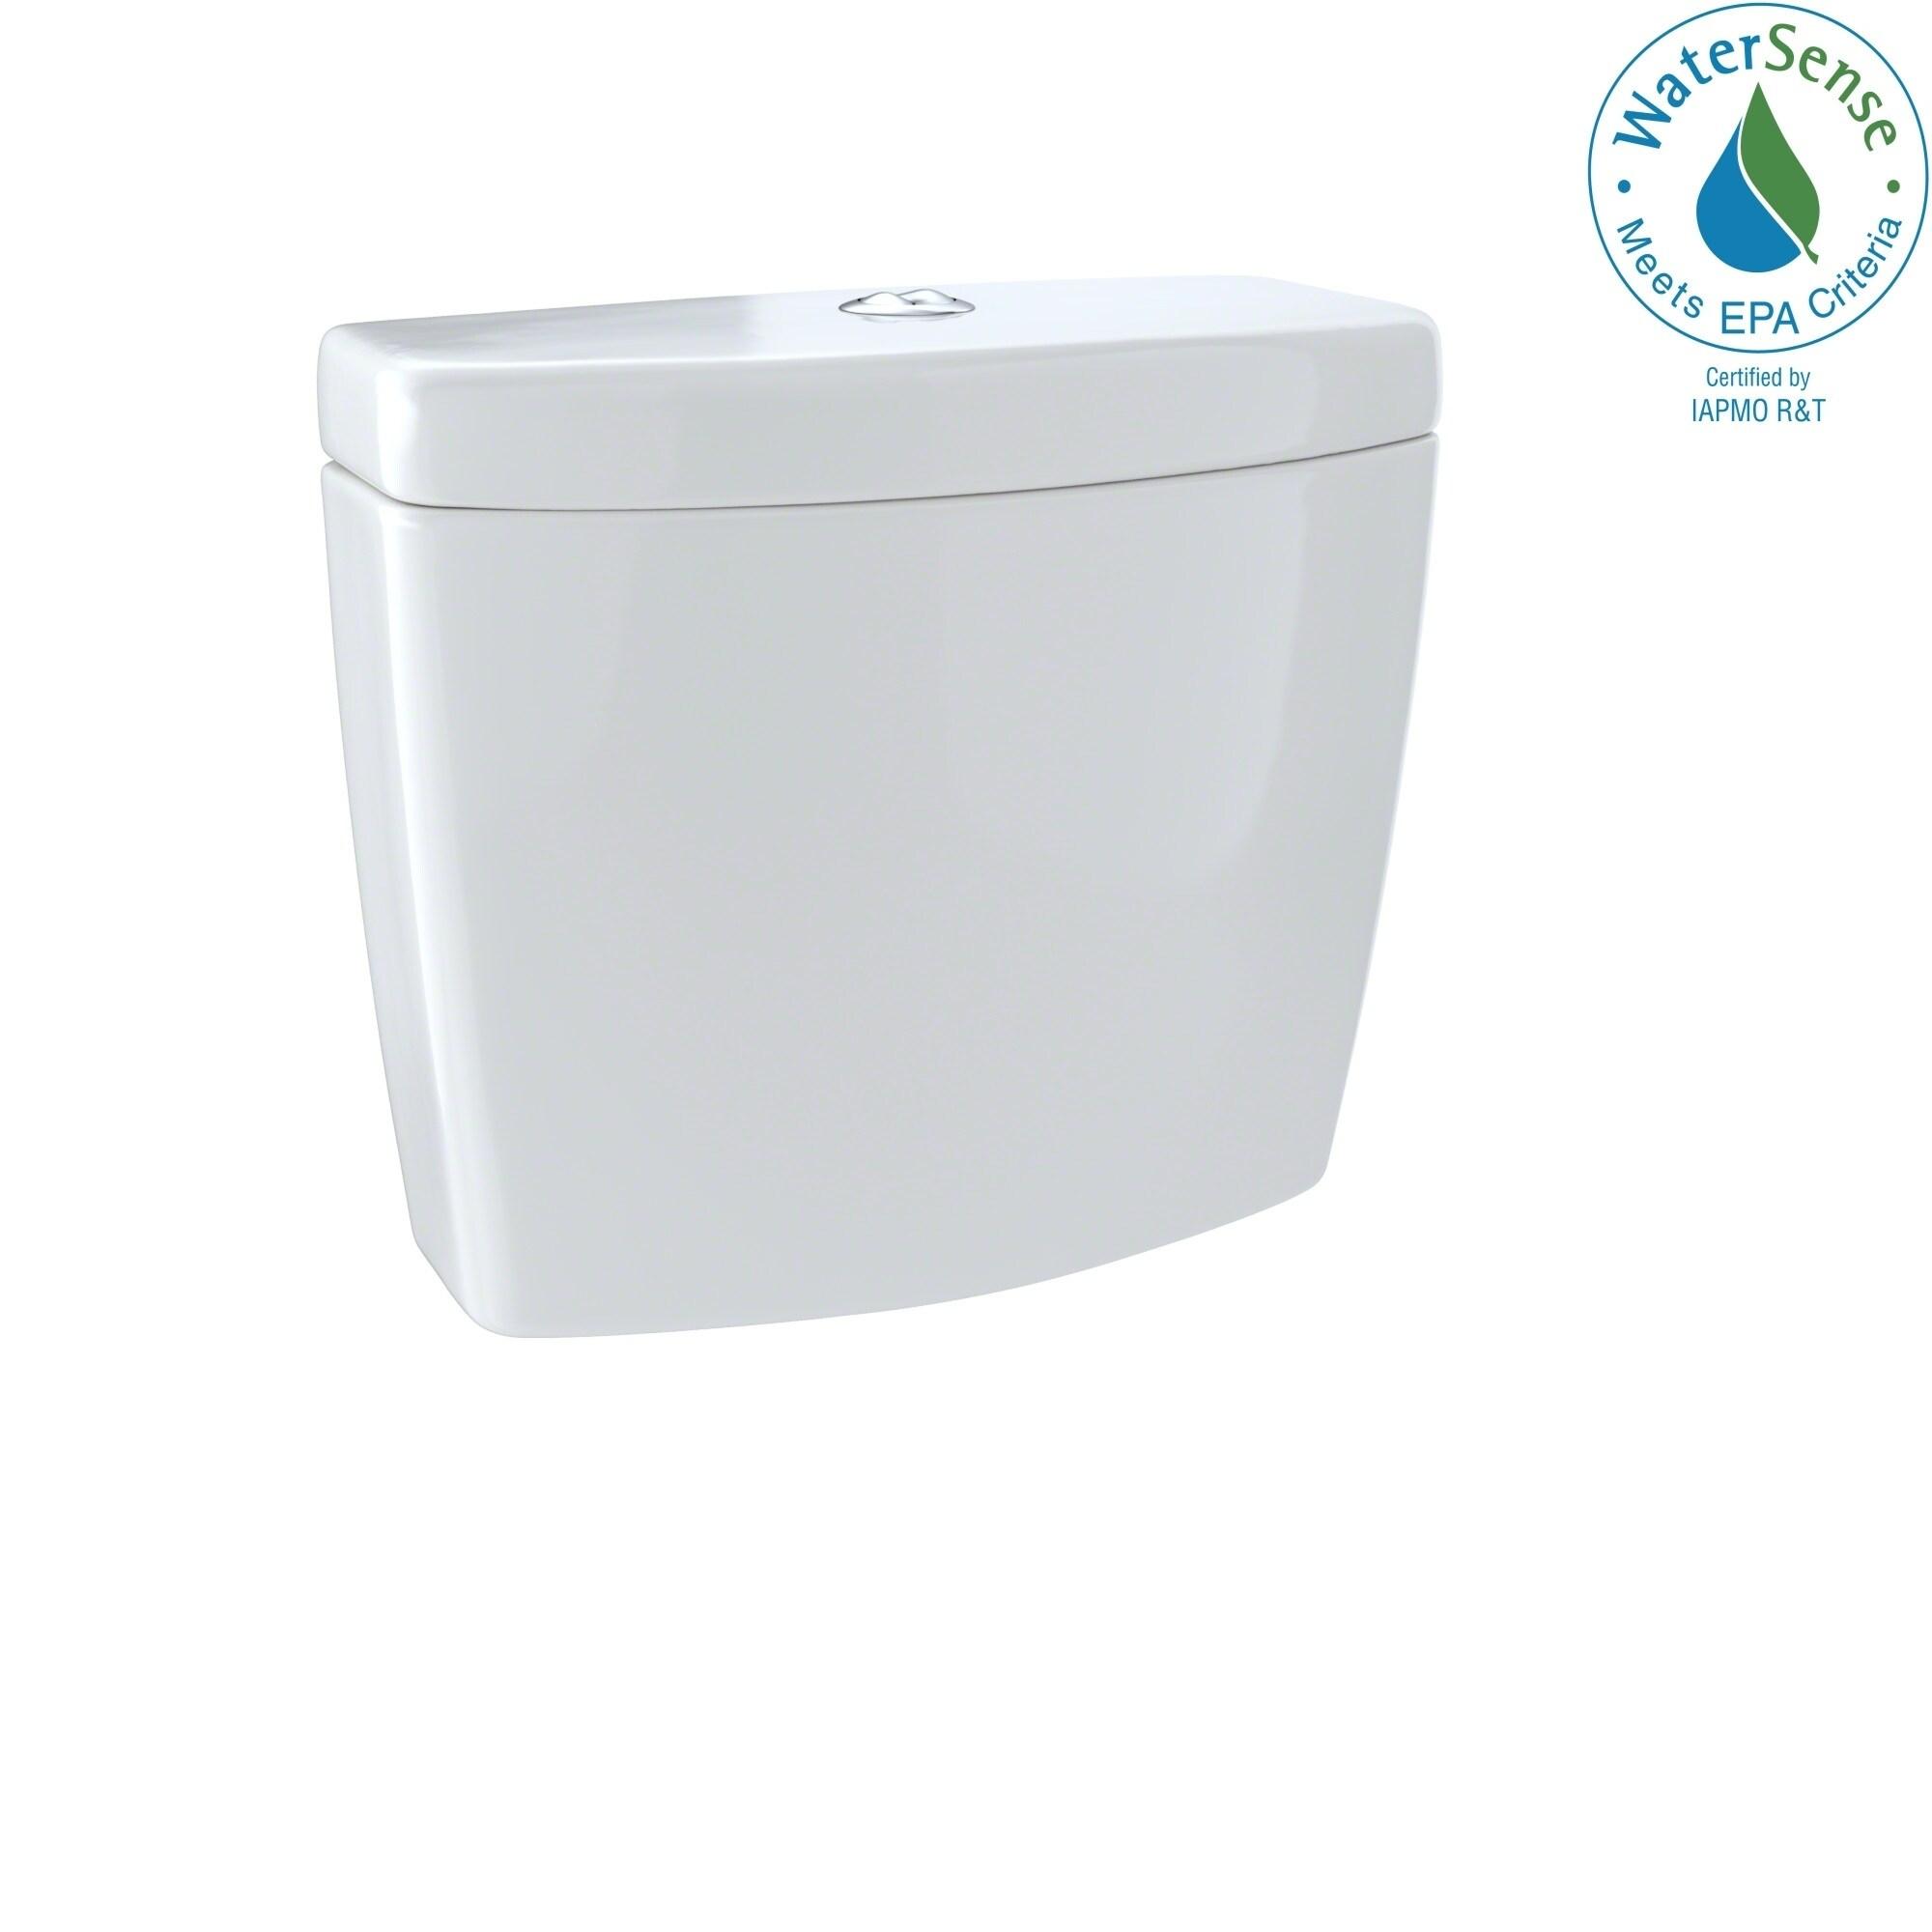 Toto Dual Flush Toilet Tank Colonial White (Colonial White)